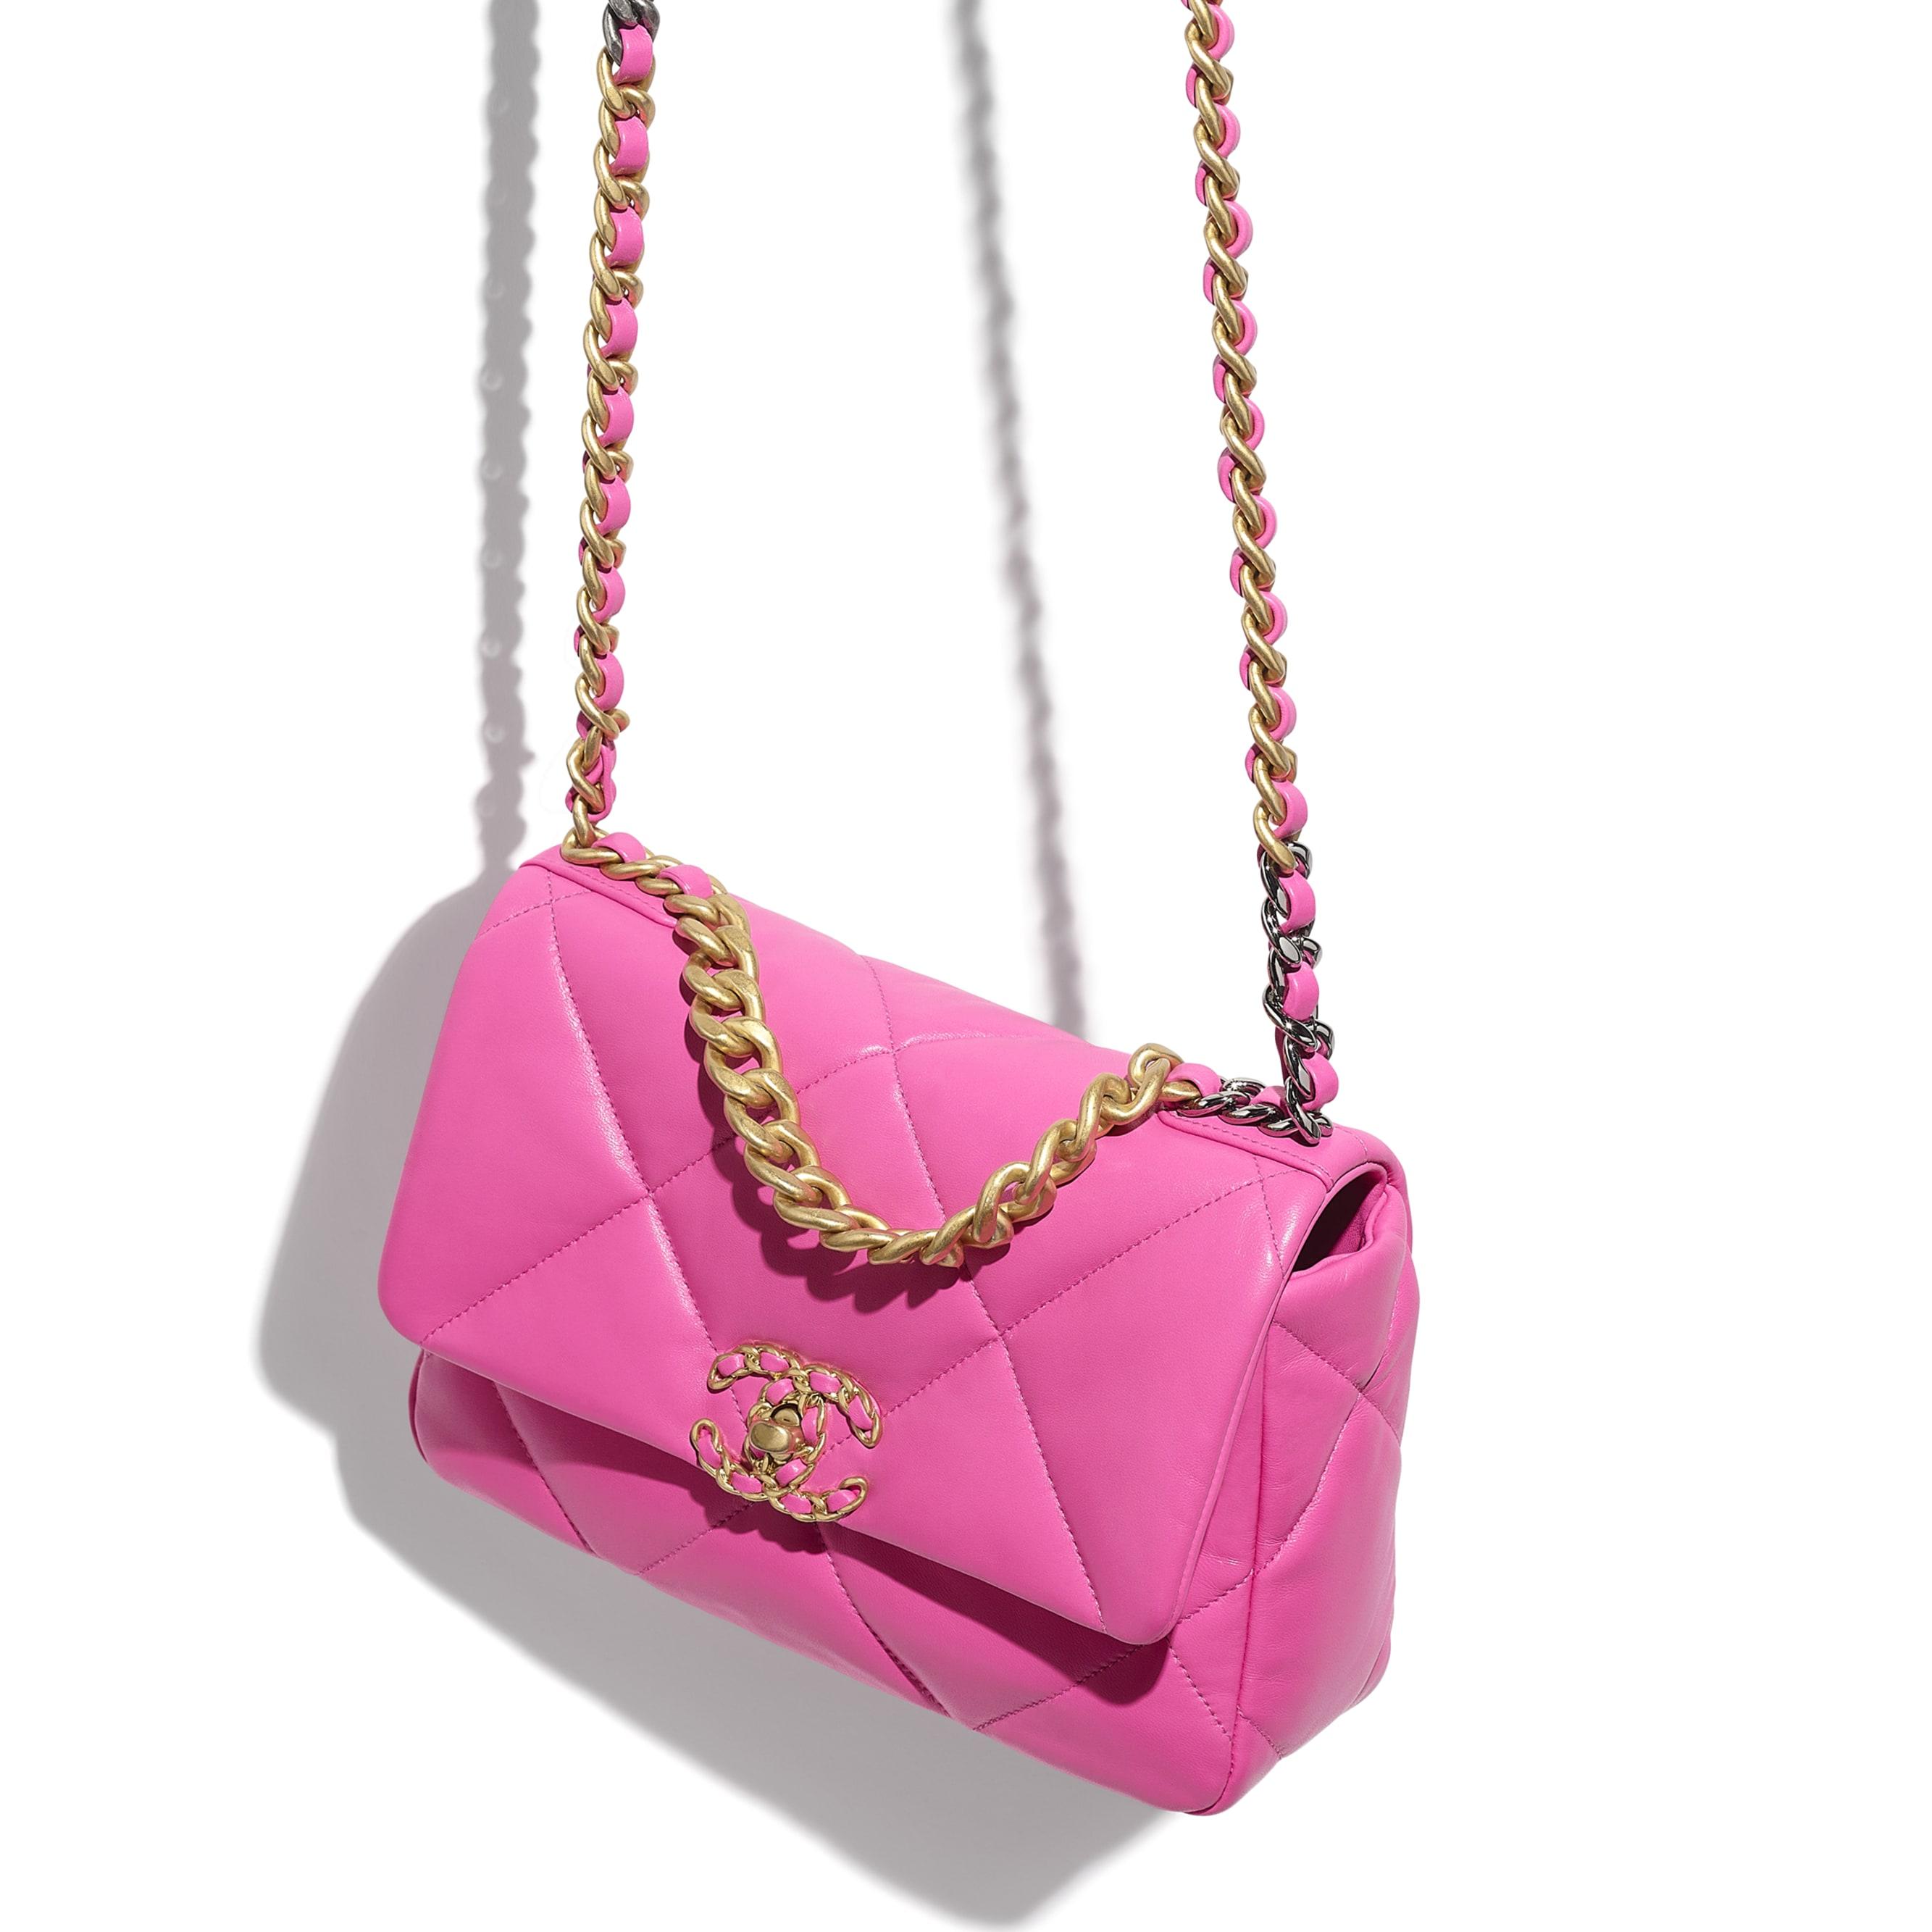 CHANEL 19 Handbag - Neon Pink - Shiny Lambskin, Gold-Tone, Silver-Tone & Ruthenium-Finish Metal - CHANEL - Extra view - see standard sized version